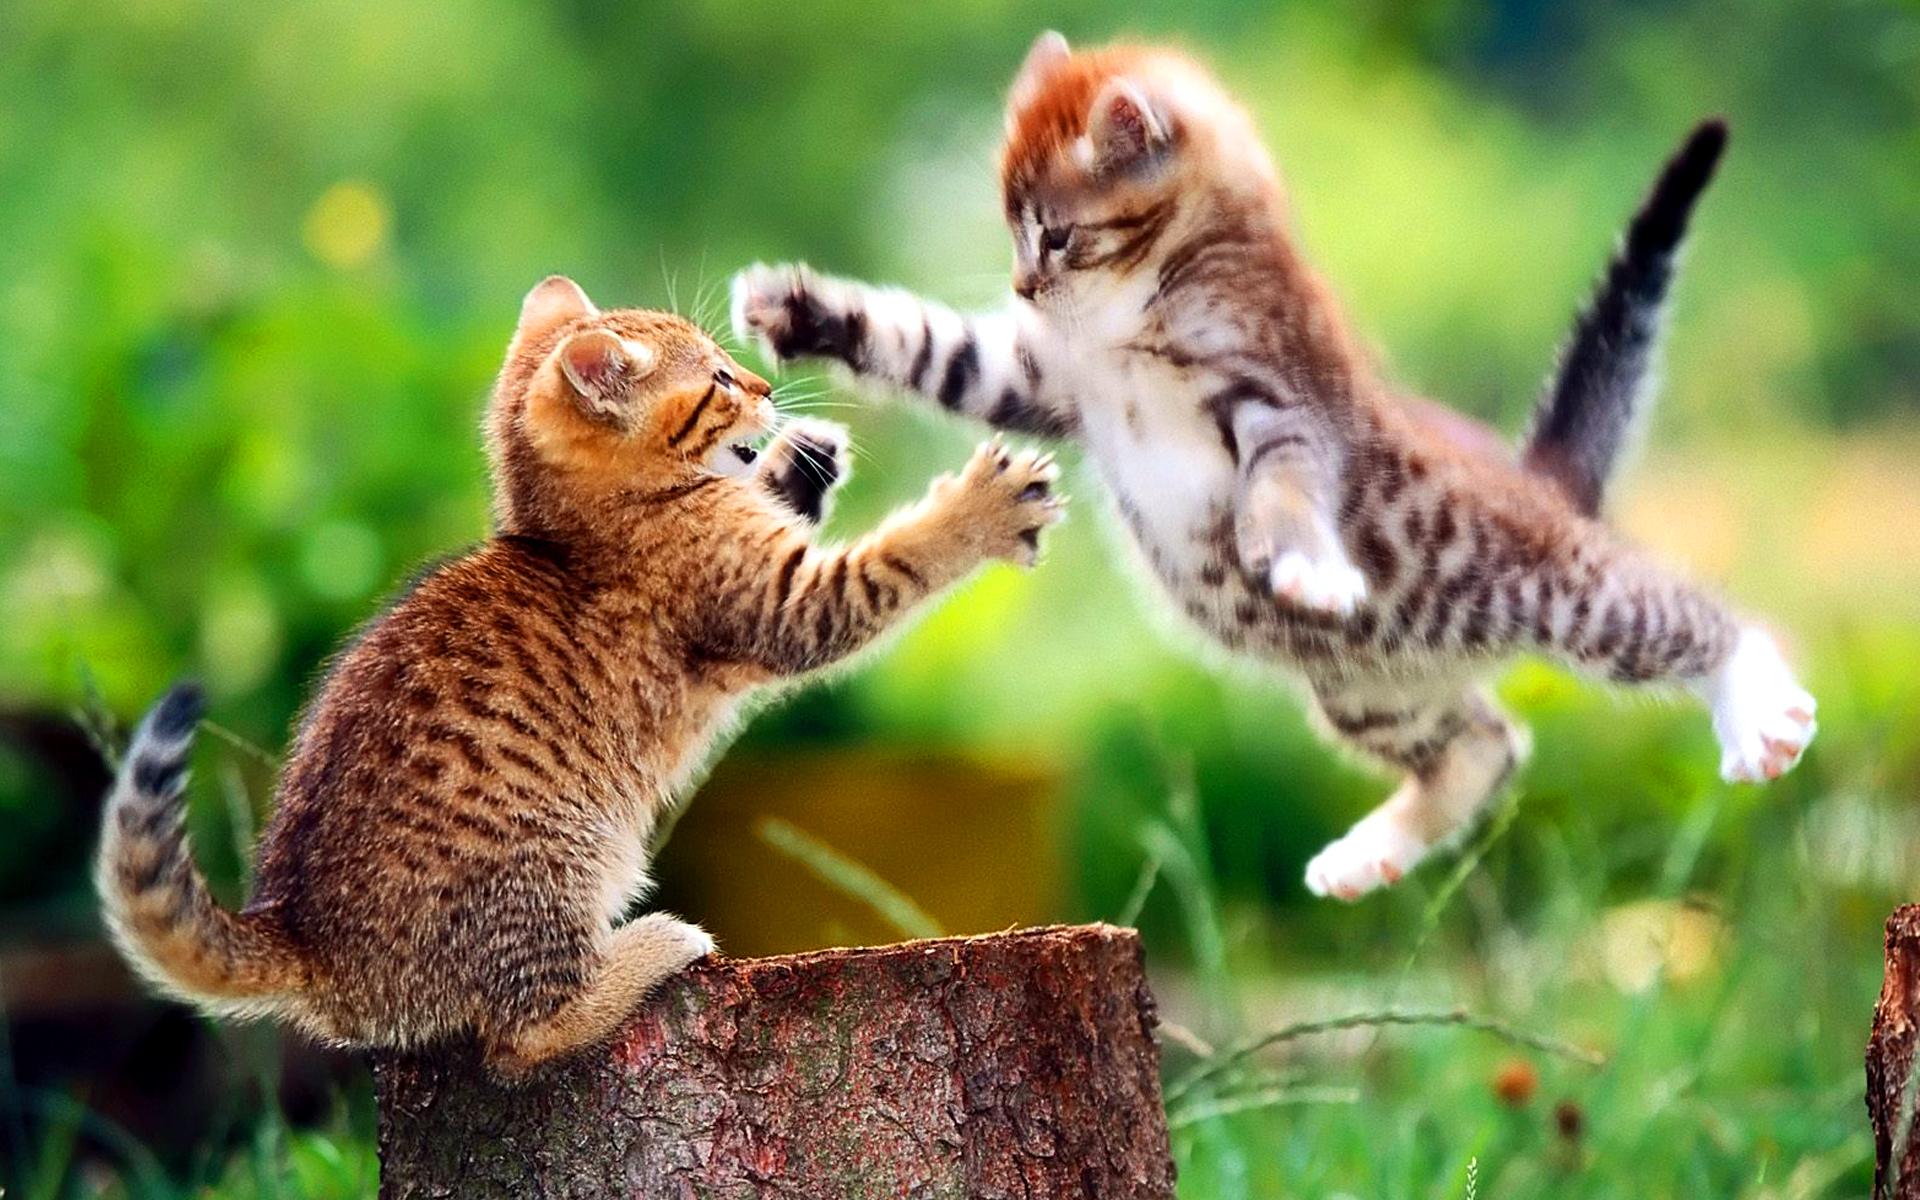 cat_fighting_animals_mobile_wallpaper.jpg